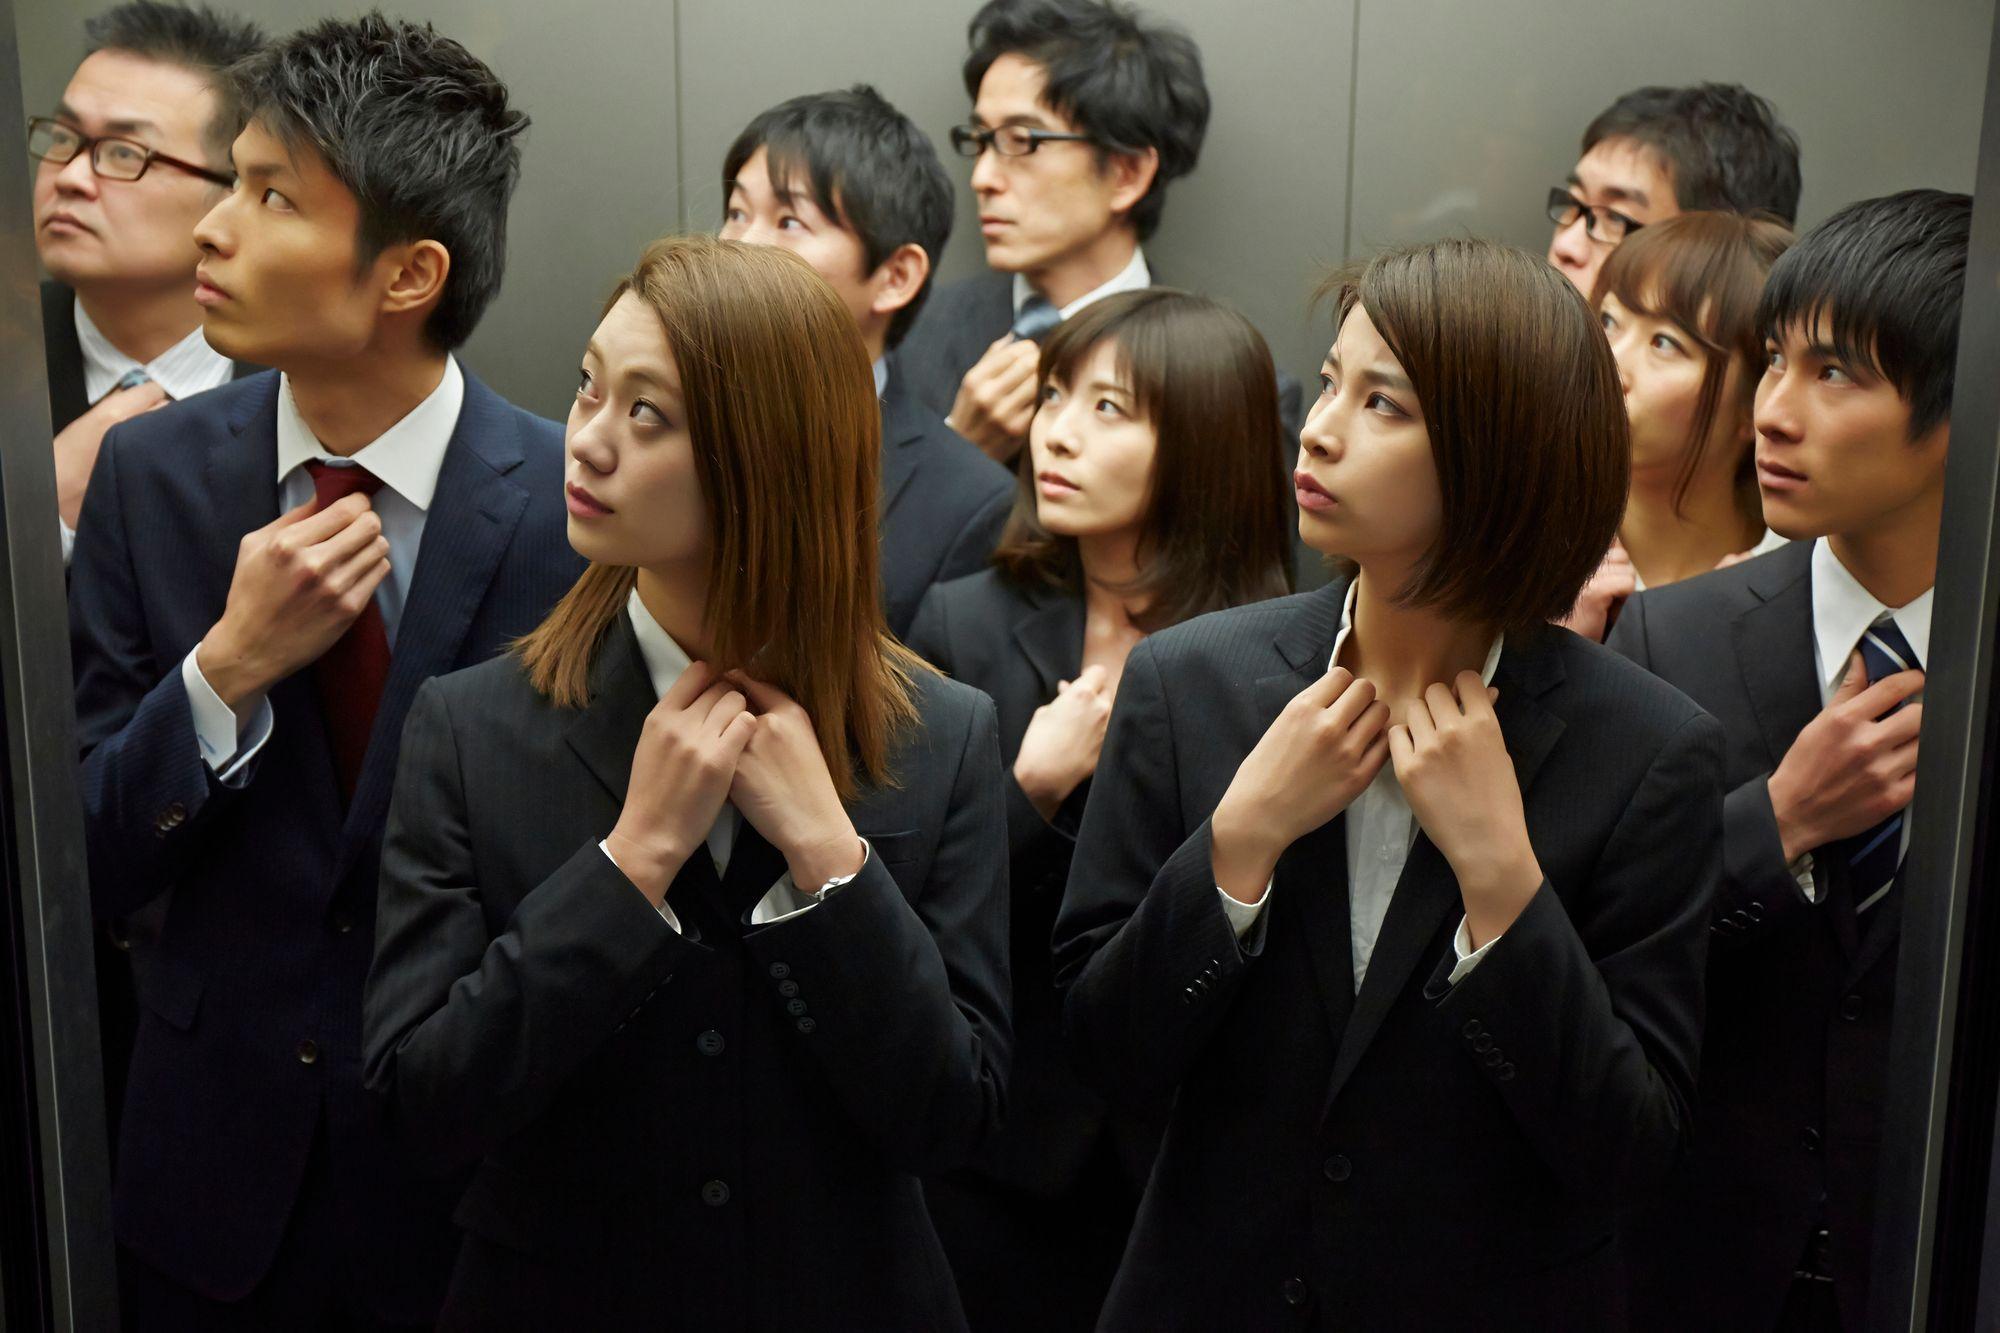 NTTが「ジョブ型」人事制度を全管理職に拡大。新規事業の加速なるか